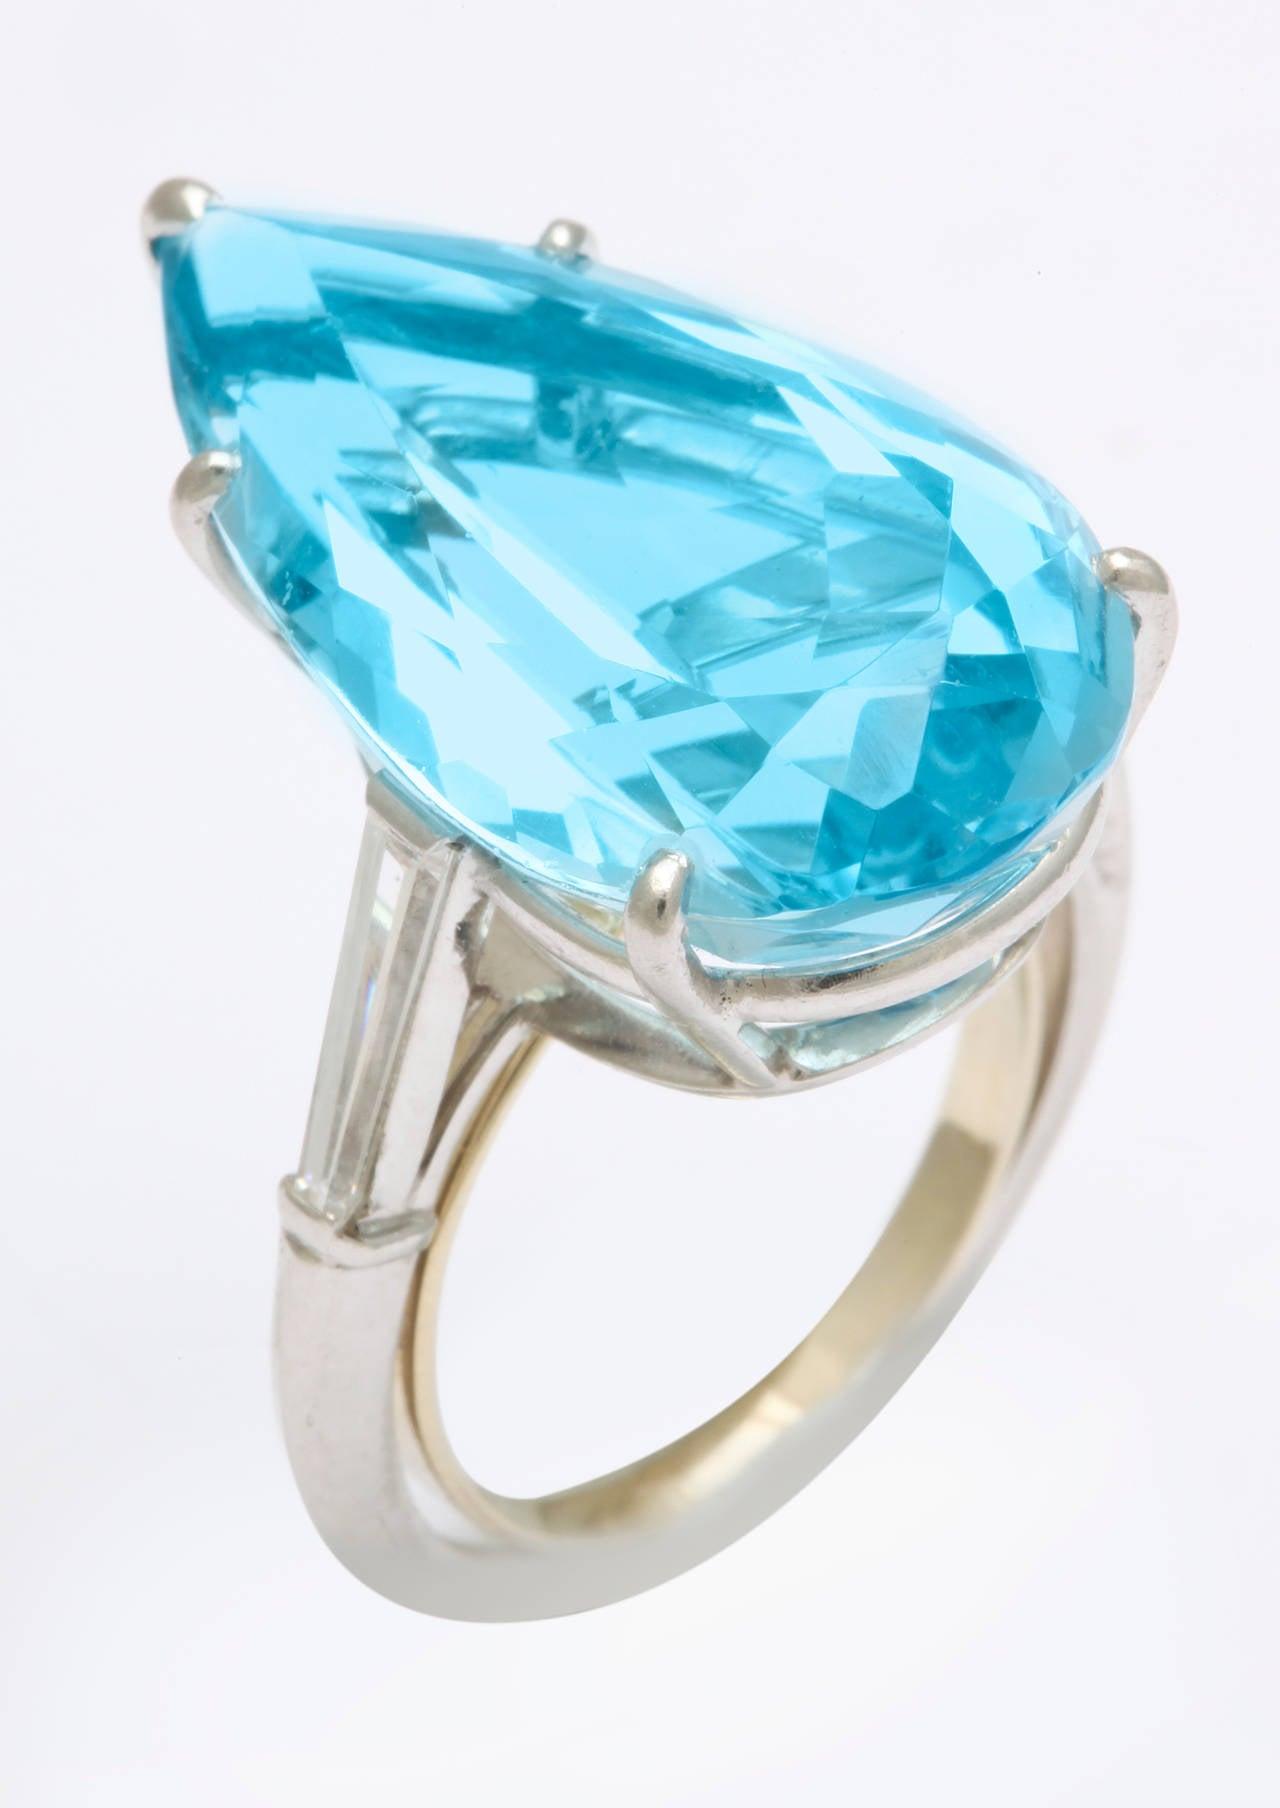 Women's 1950s Cartier Pear Shaped Aquamarine Diamond Platinum Ring For Sale